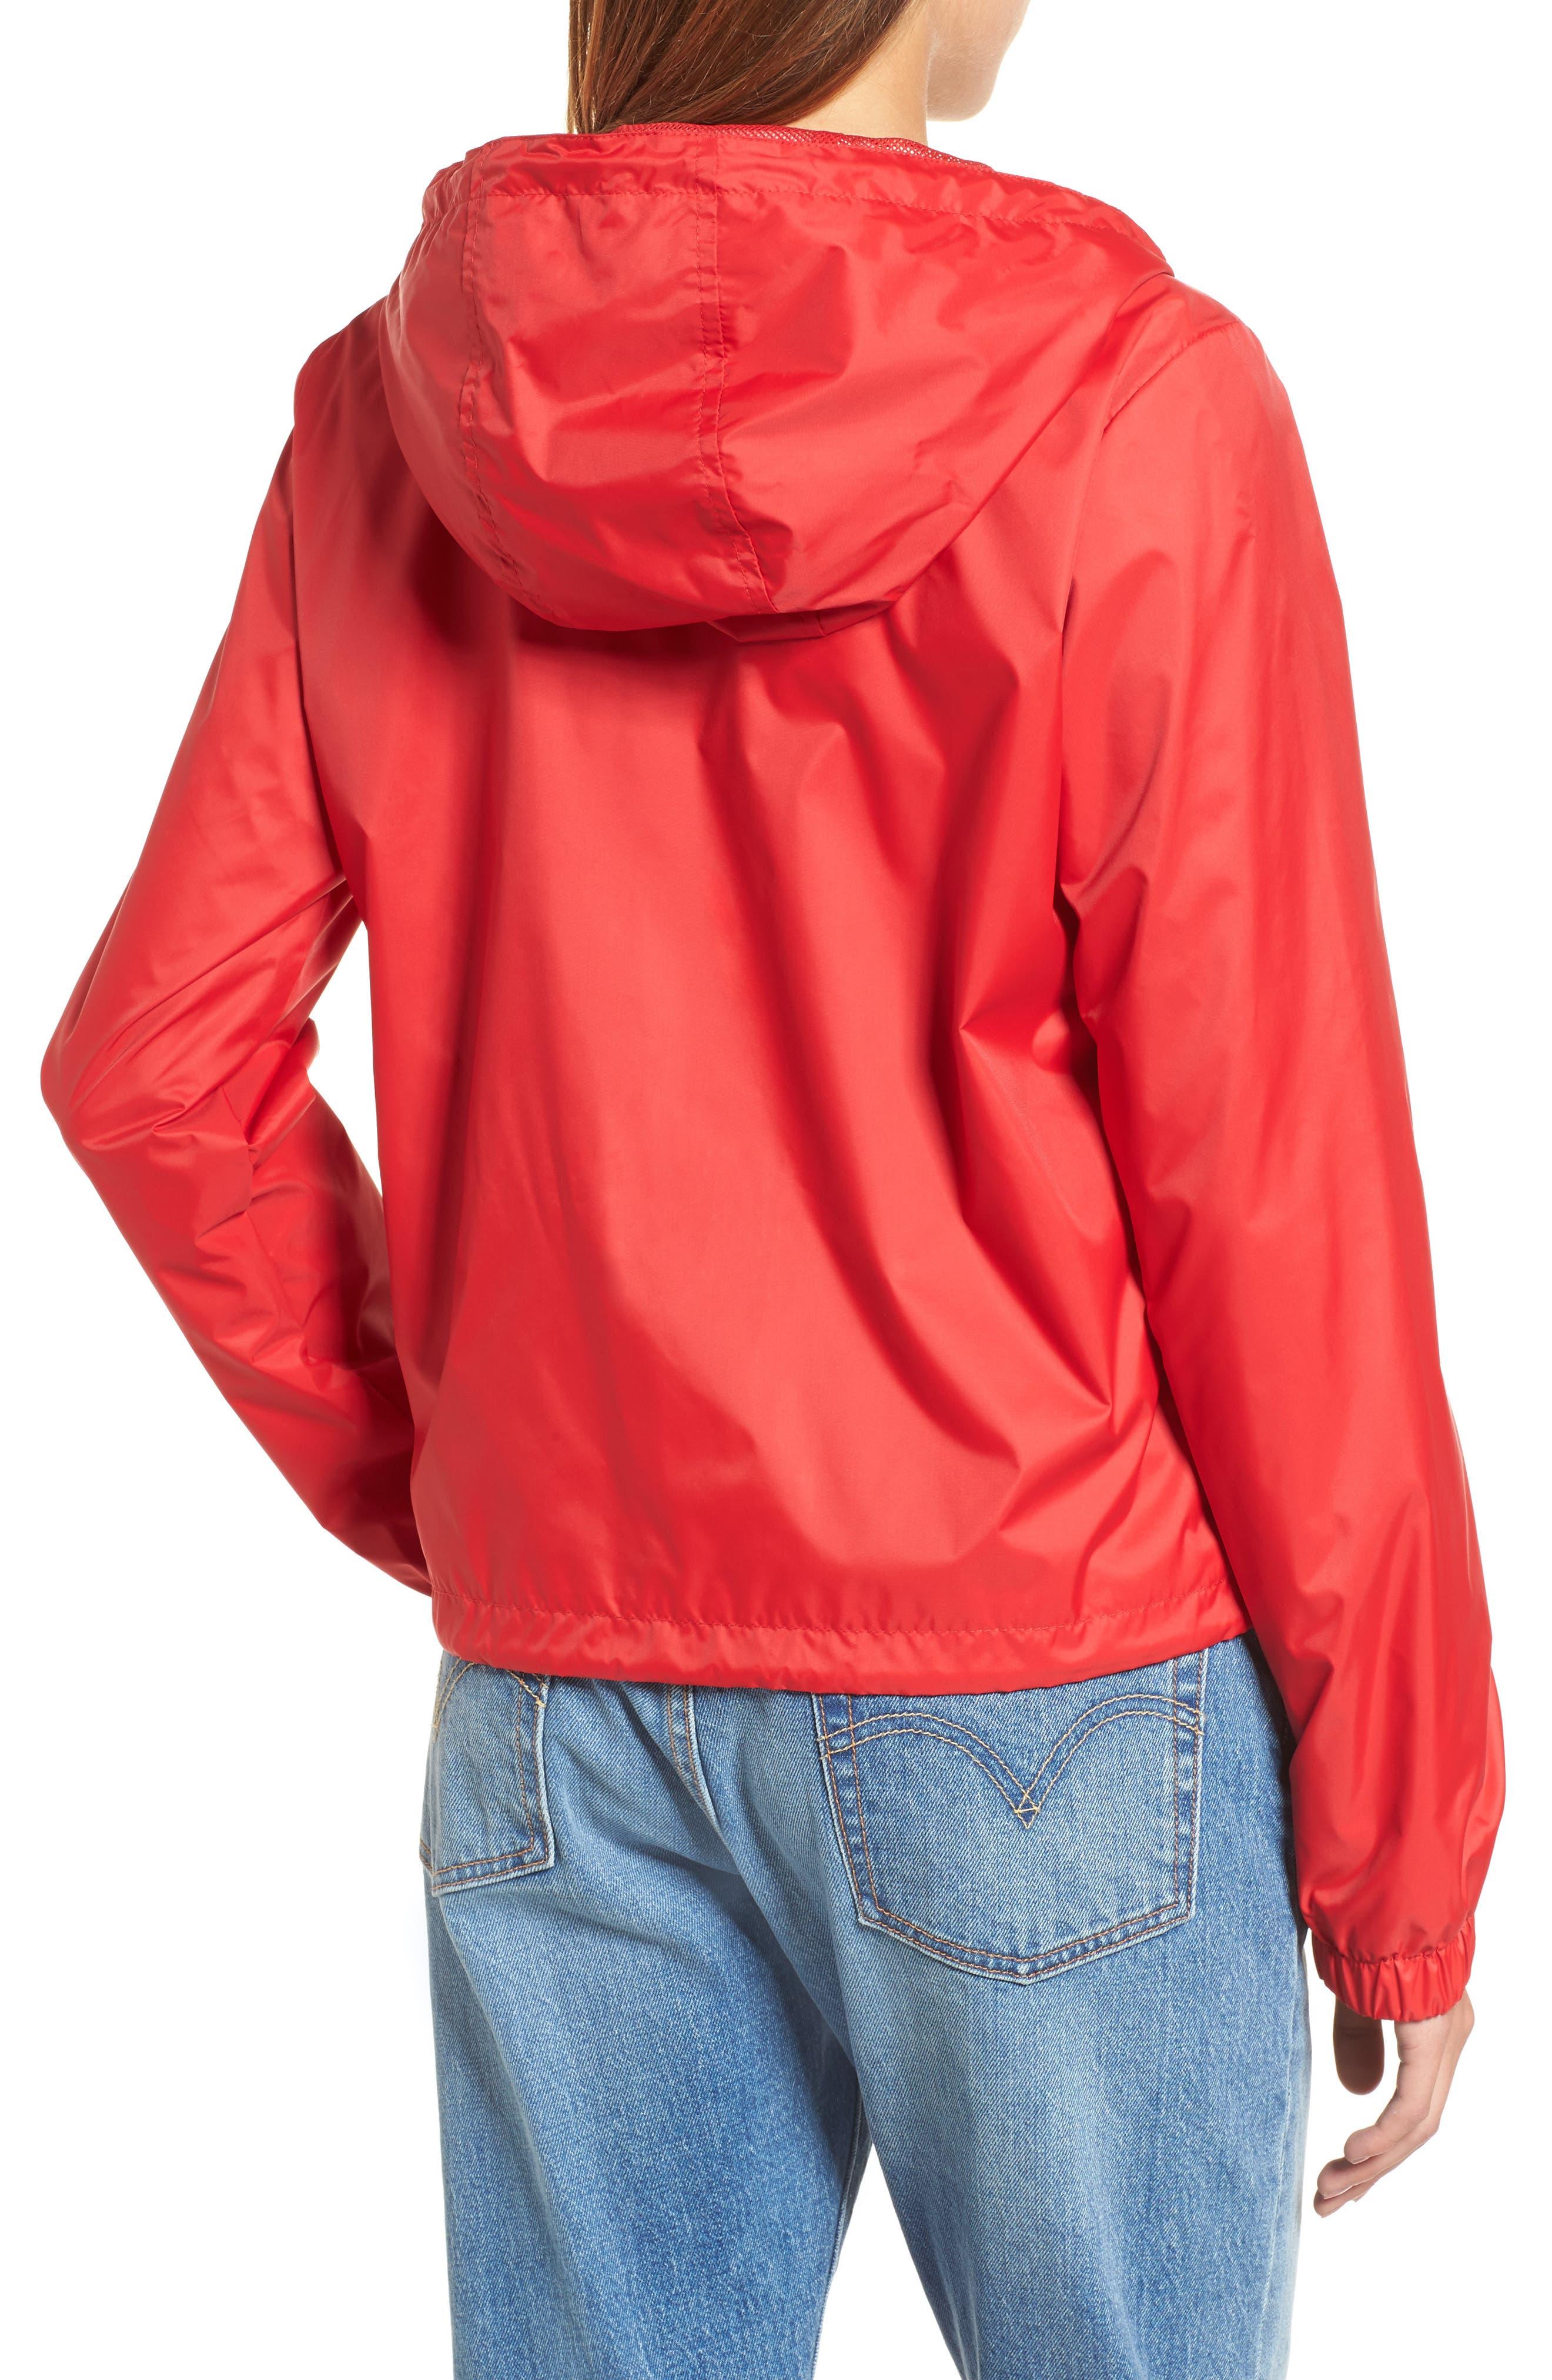 Retro Hooded Coach's Jacket,                             Alternate thumbnail 10, color,